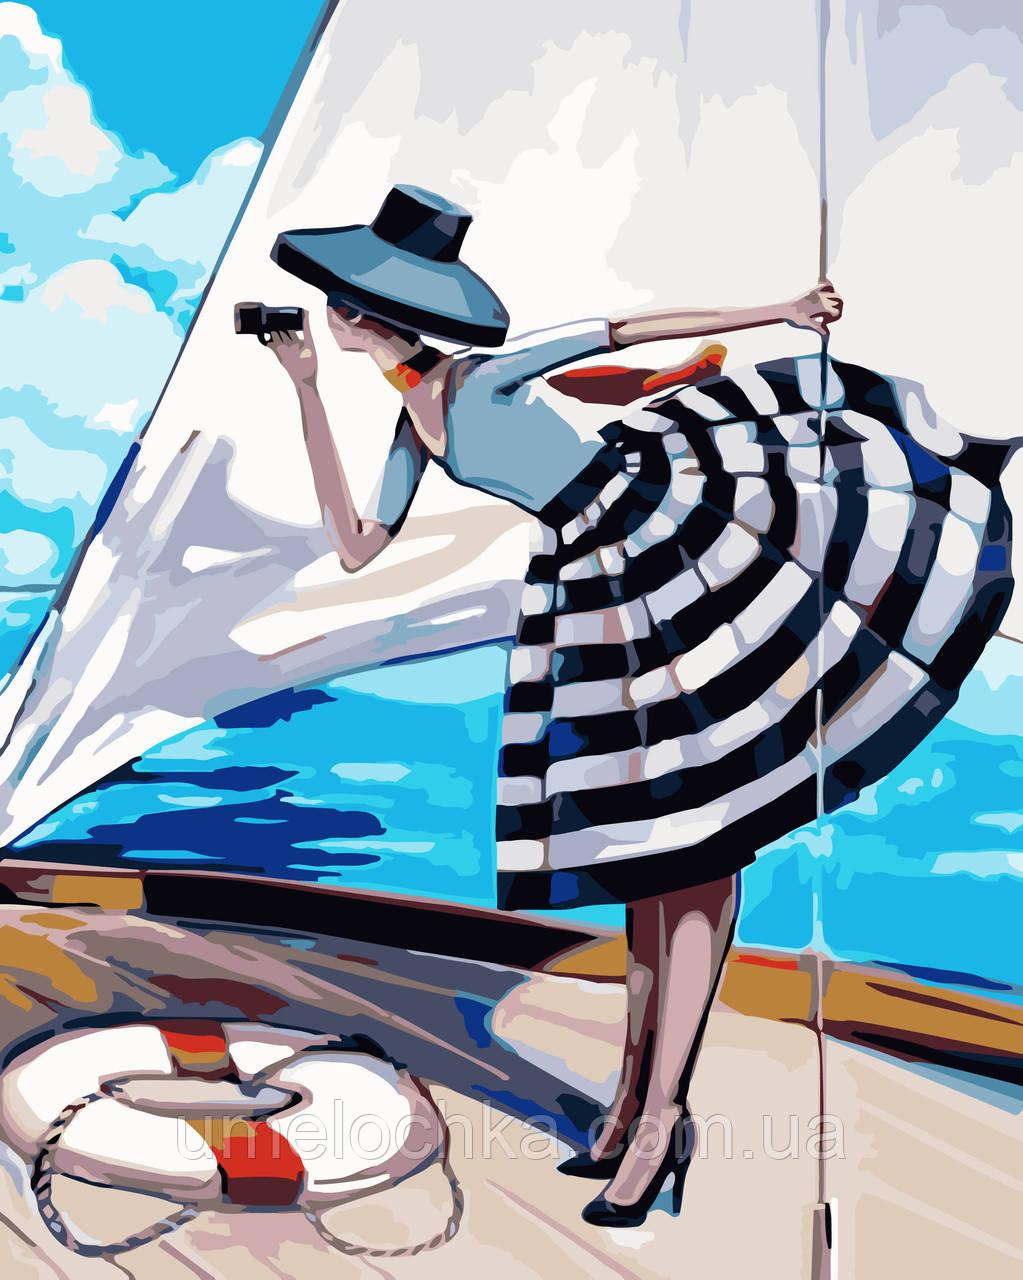 Картина по номерам без коробки Идейка Прогулка на яхте Худ Биддл Триш (KHO2644) 40 х 50 см